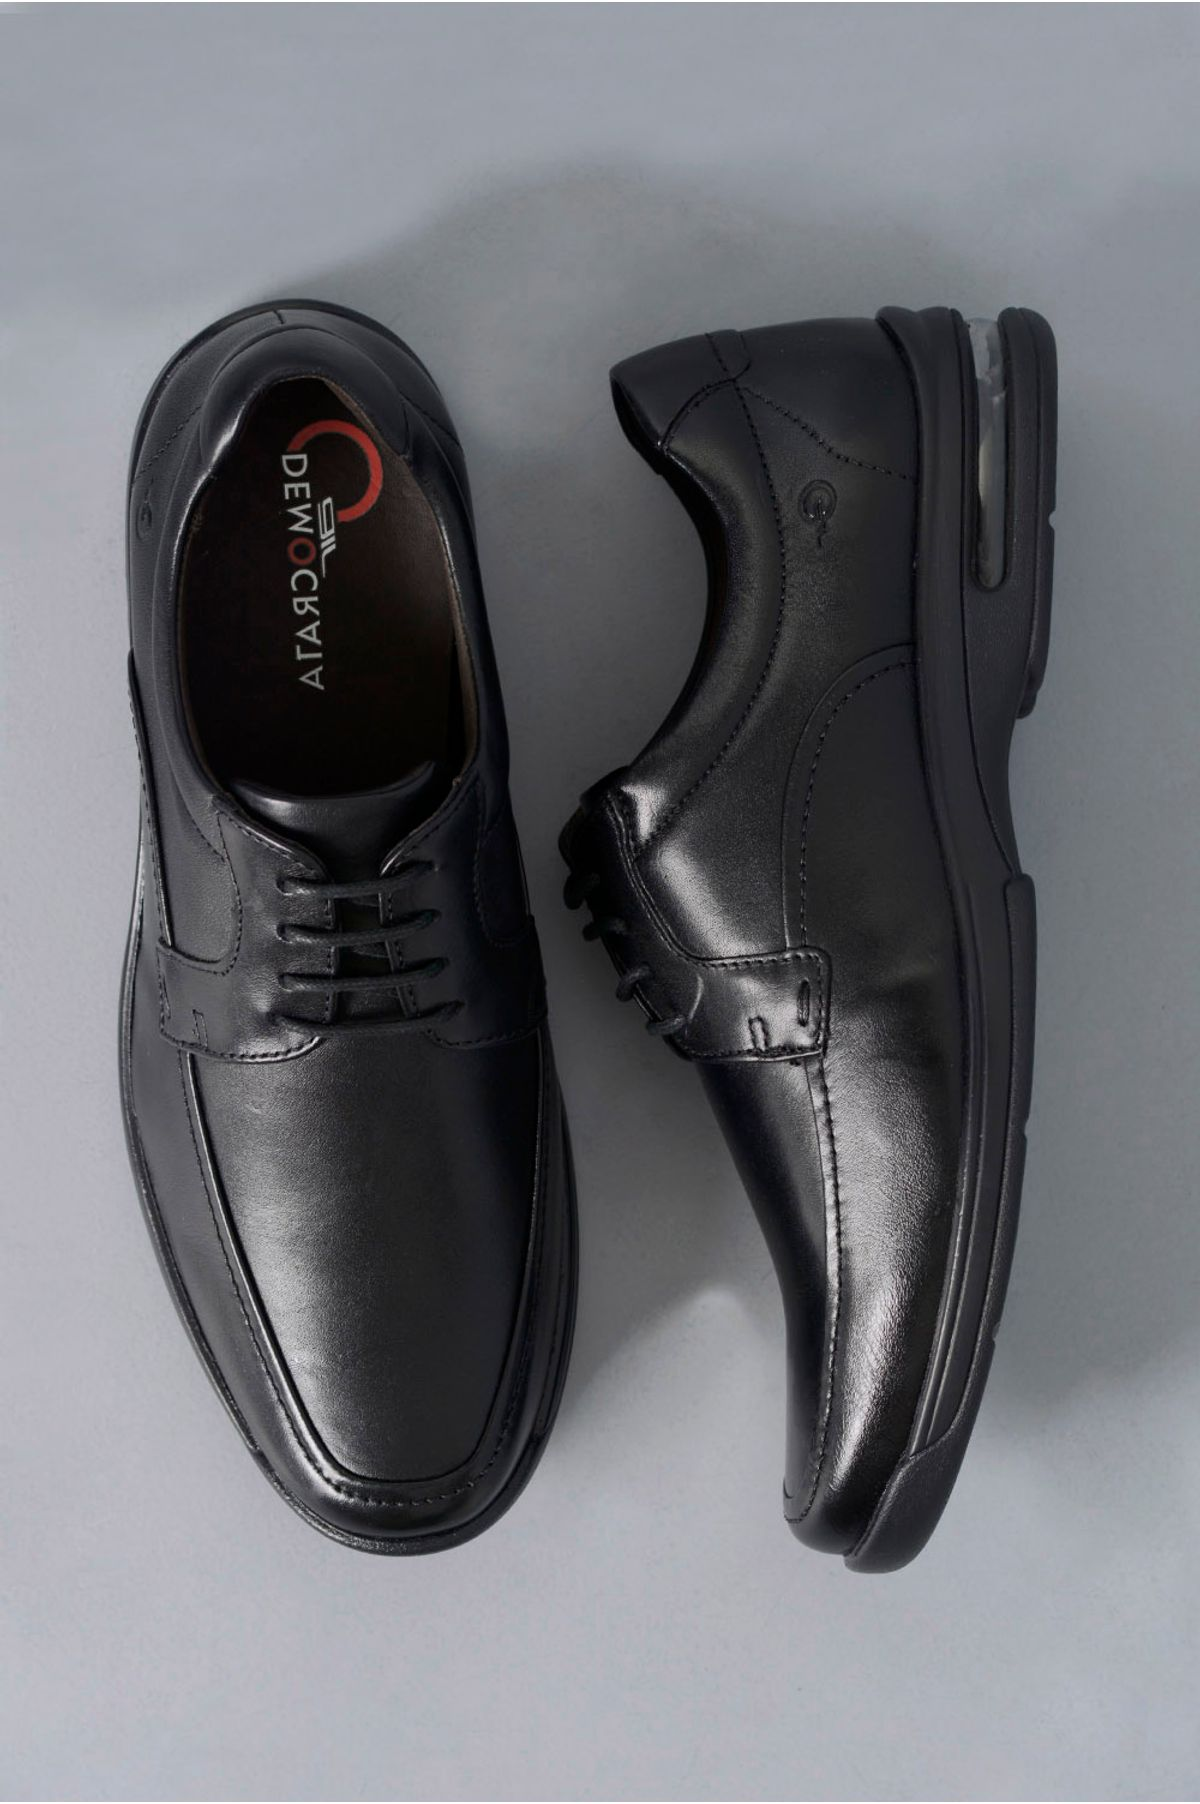 447419061 Sapato Masculino Social Democrata Air Fly PRETO - Mundial Calçados